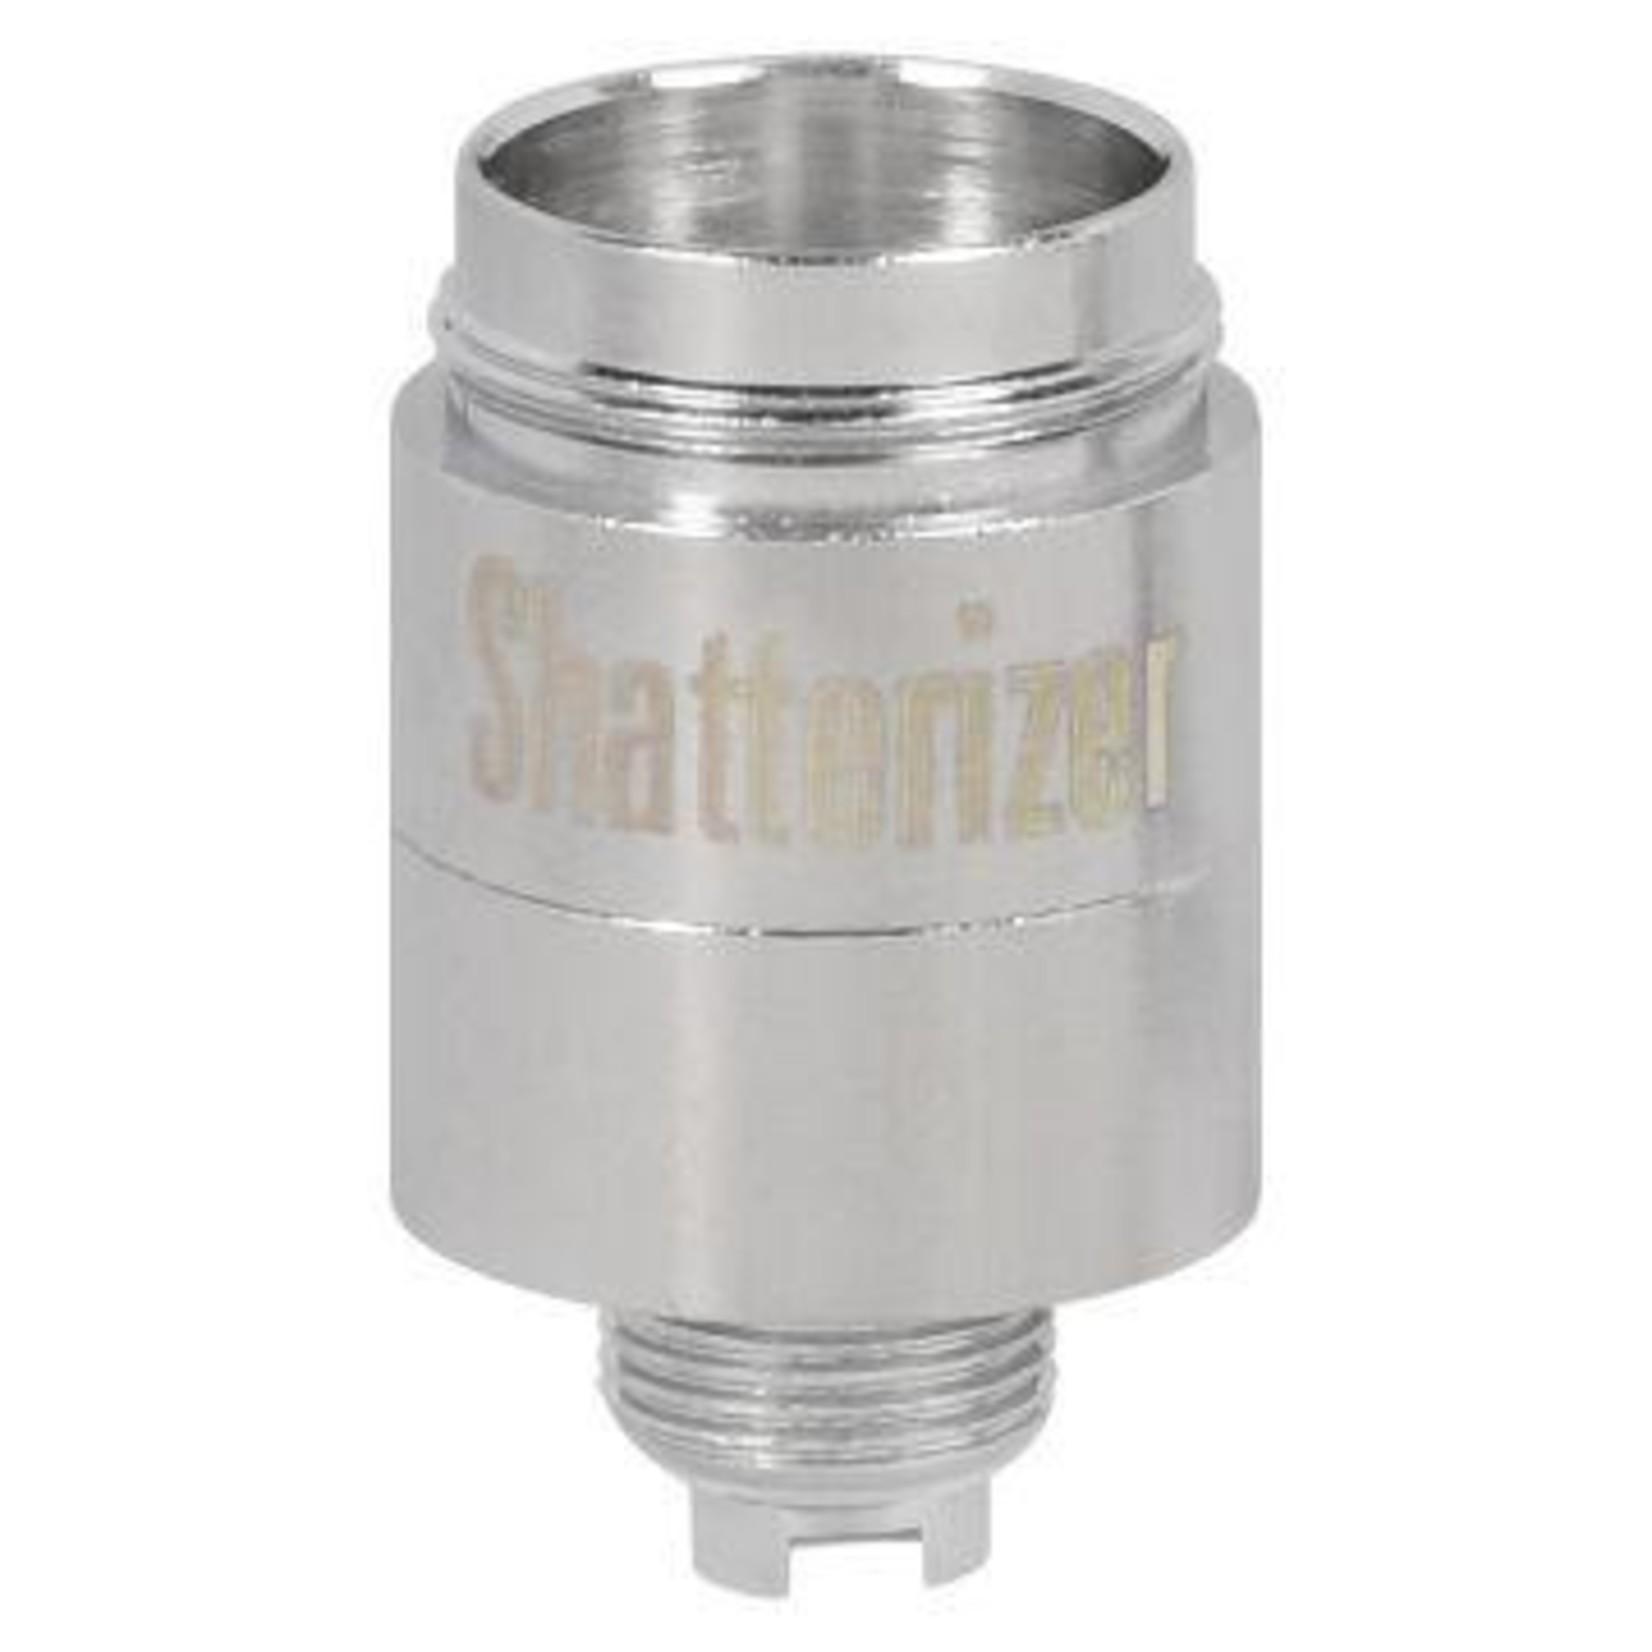 Shatterizer SHATTERIZER QUARTS (QCD) COIL (1)